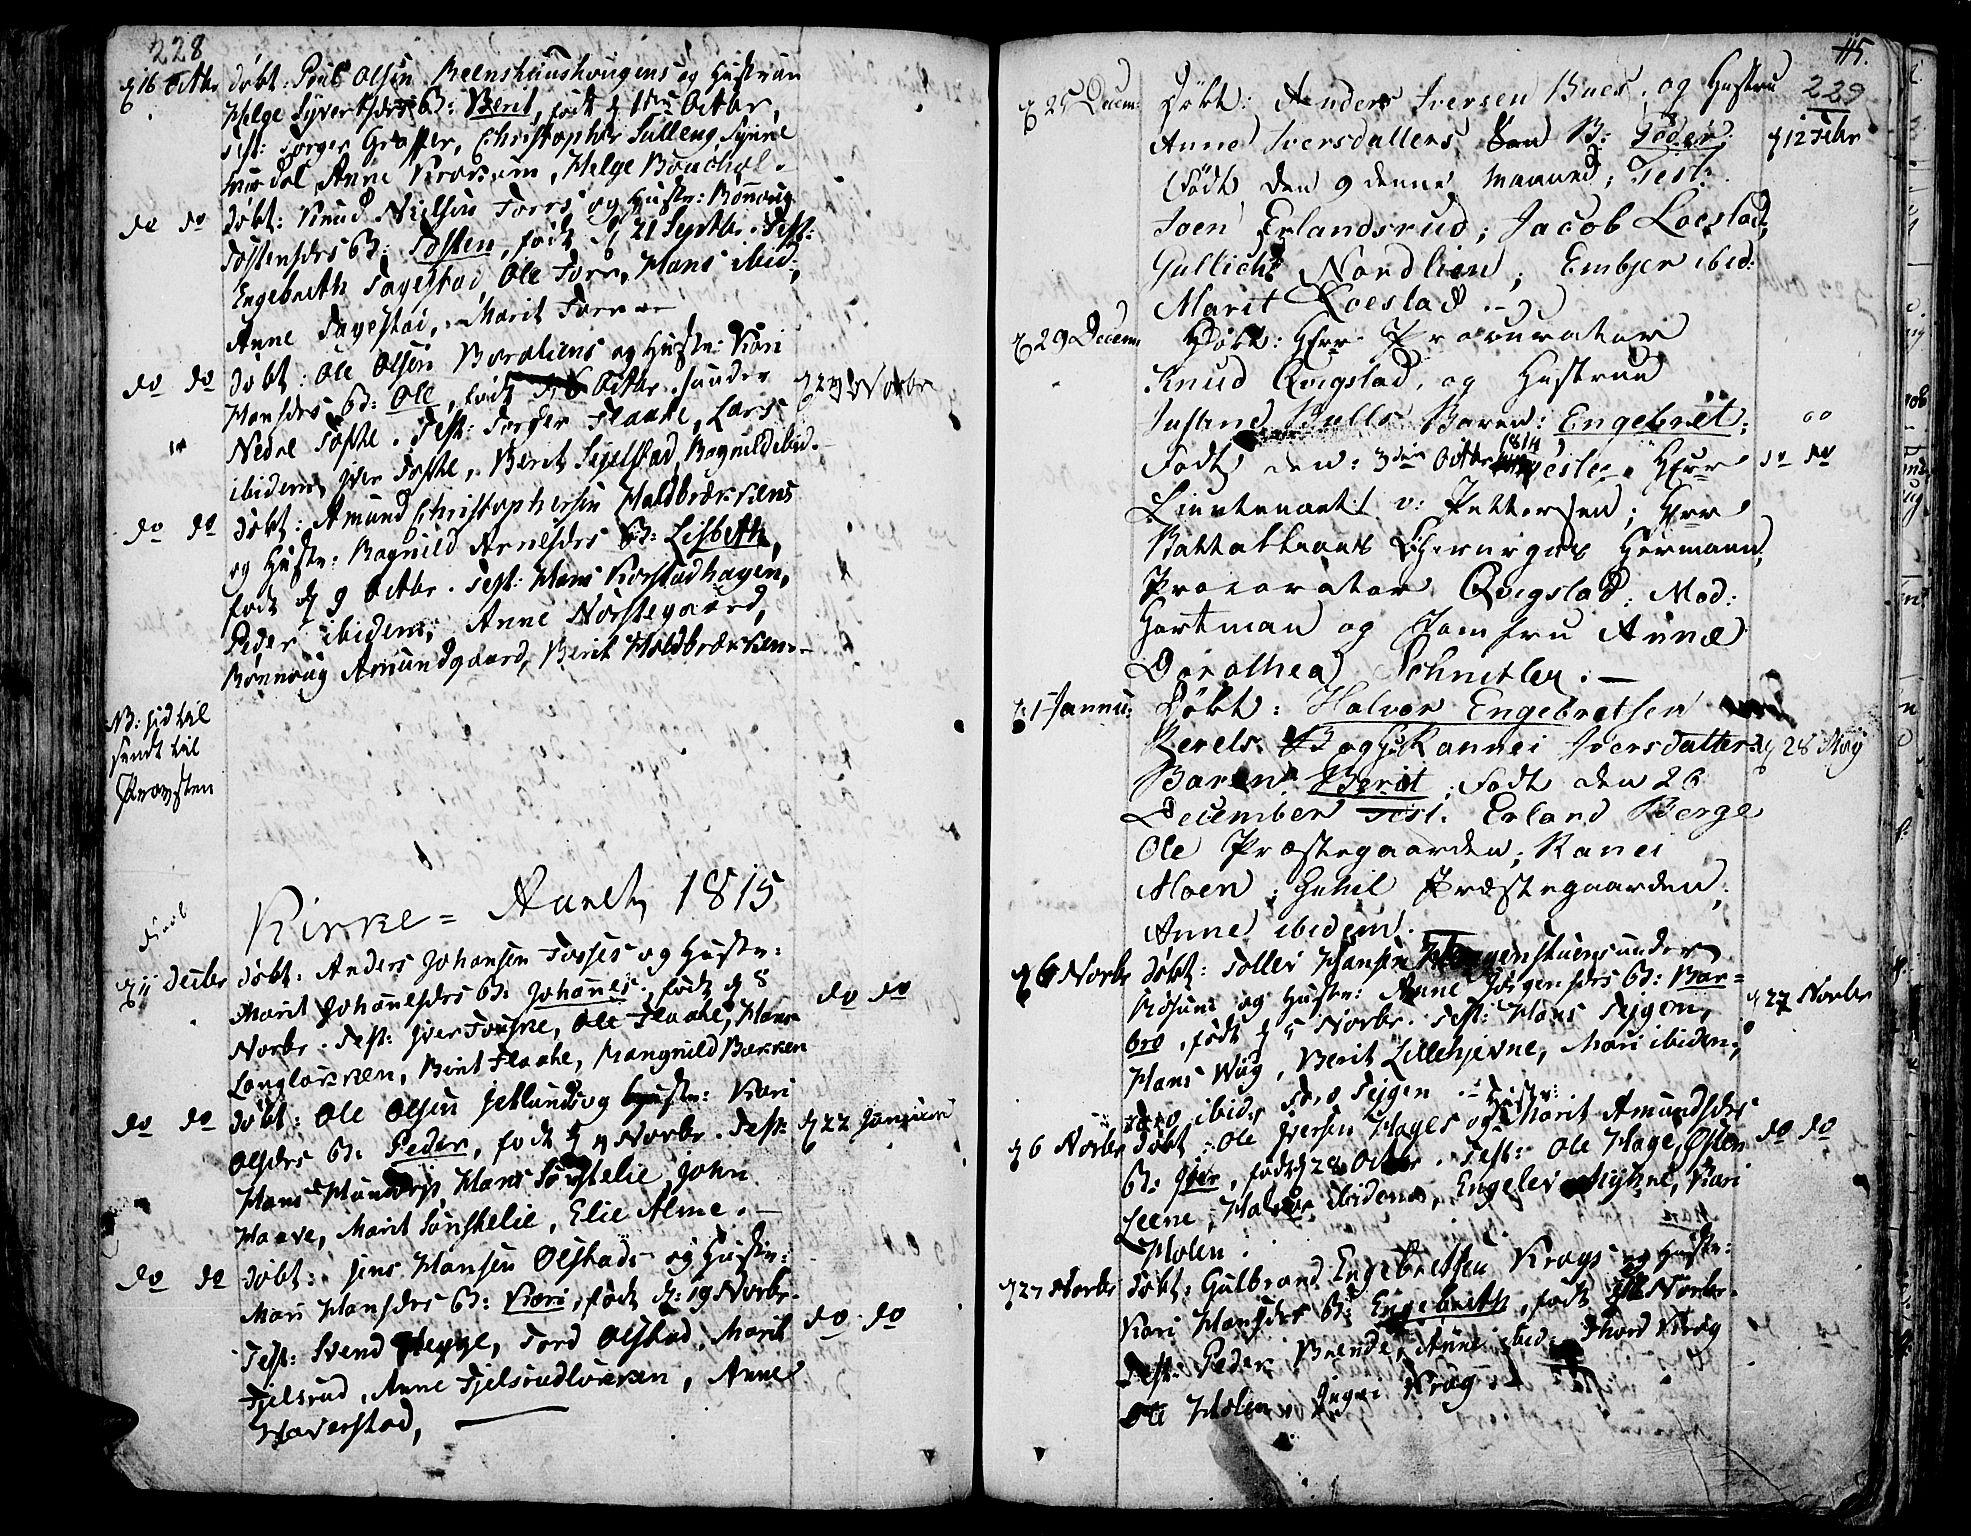 SAH, Fron prestekontor, H/Ha/Haa/L0001: Ministerialbok nr. 1, 1799-1816, s. 228-229